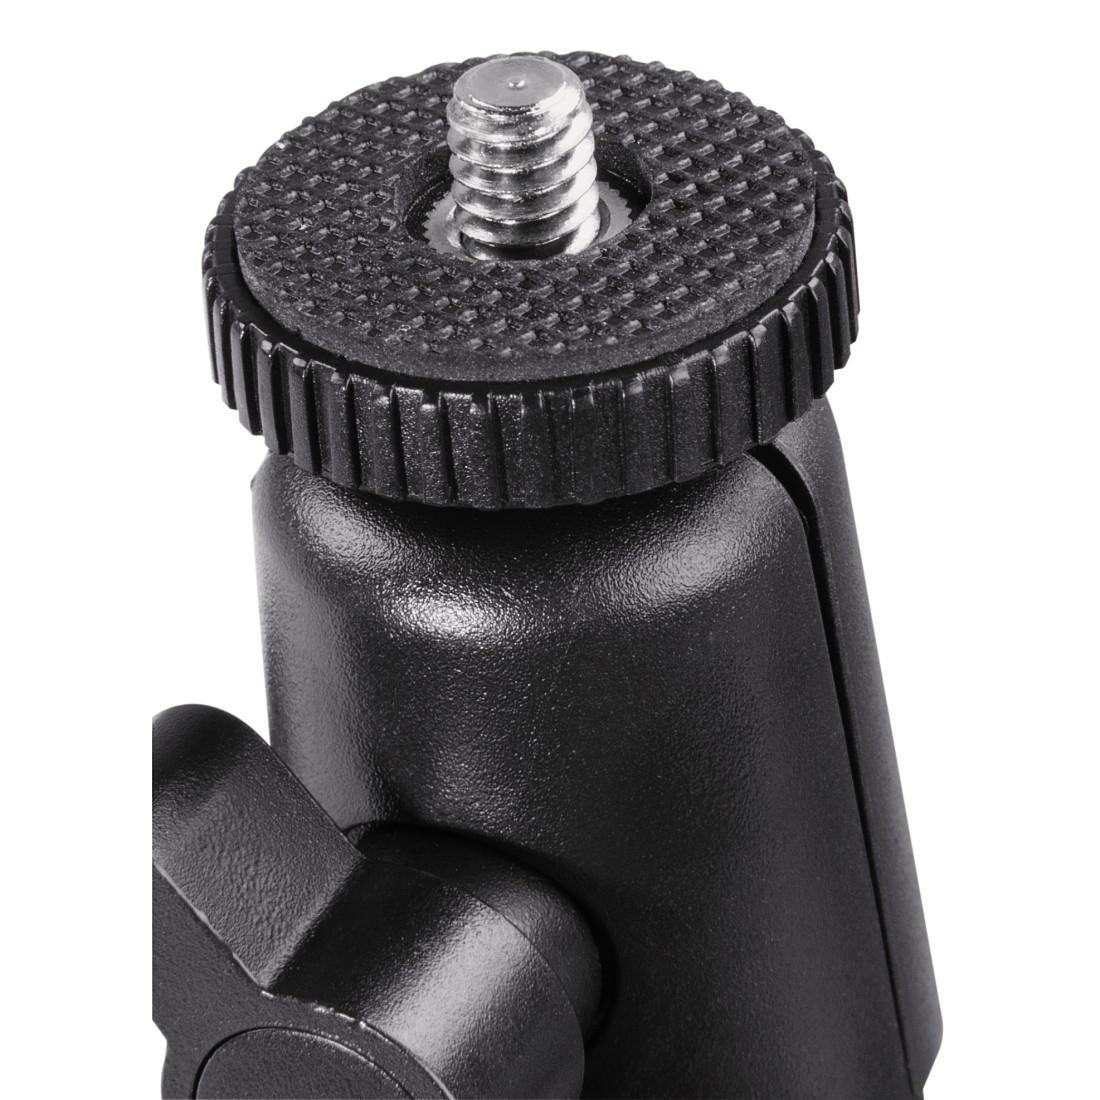 Универсална автомобилна стойка за камера HAMA 04356, Вакумно залепяне, Вртяща глава на 360°, Черен